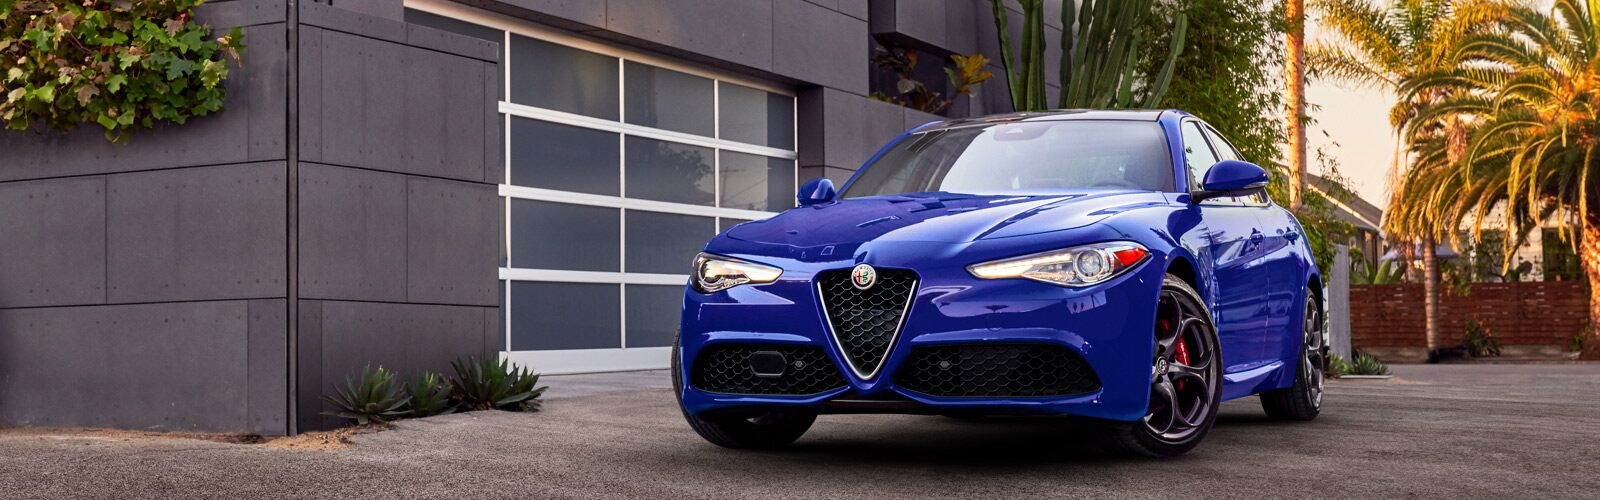 2020 Alfa Romeo Giulia Ramsey NJ